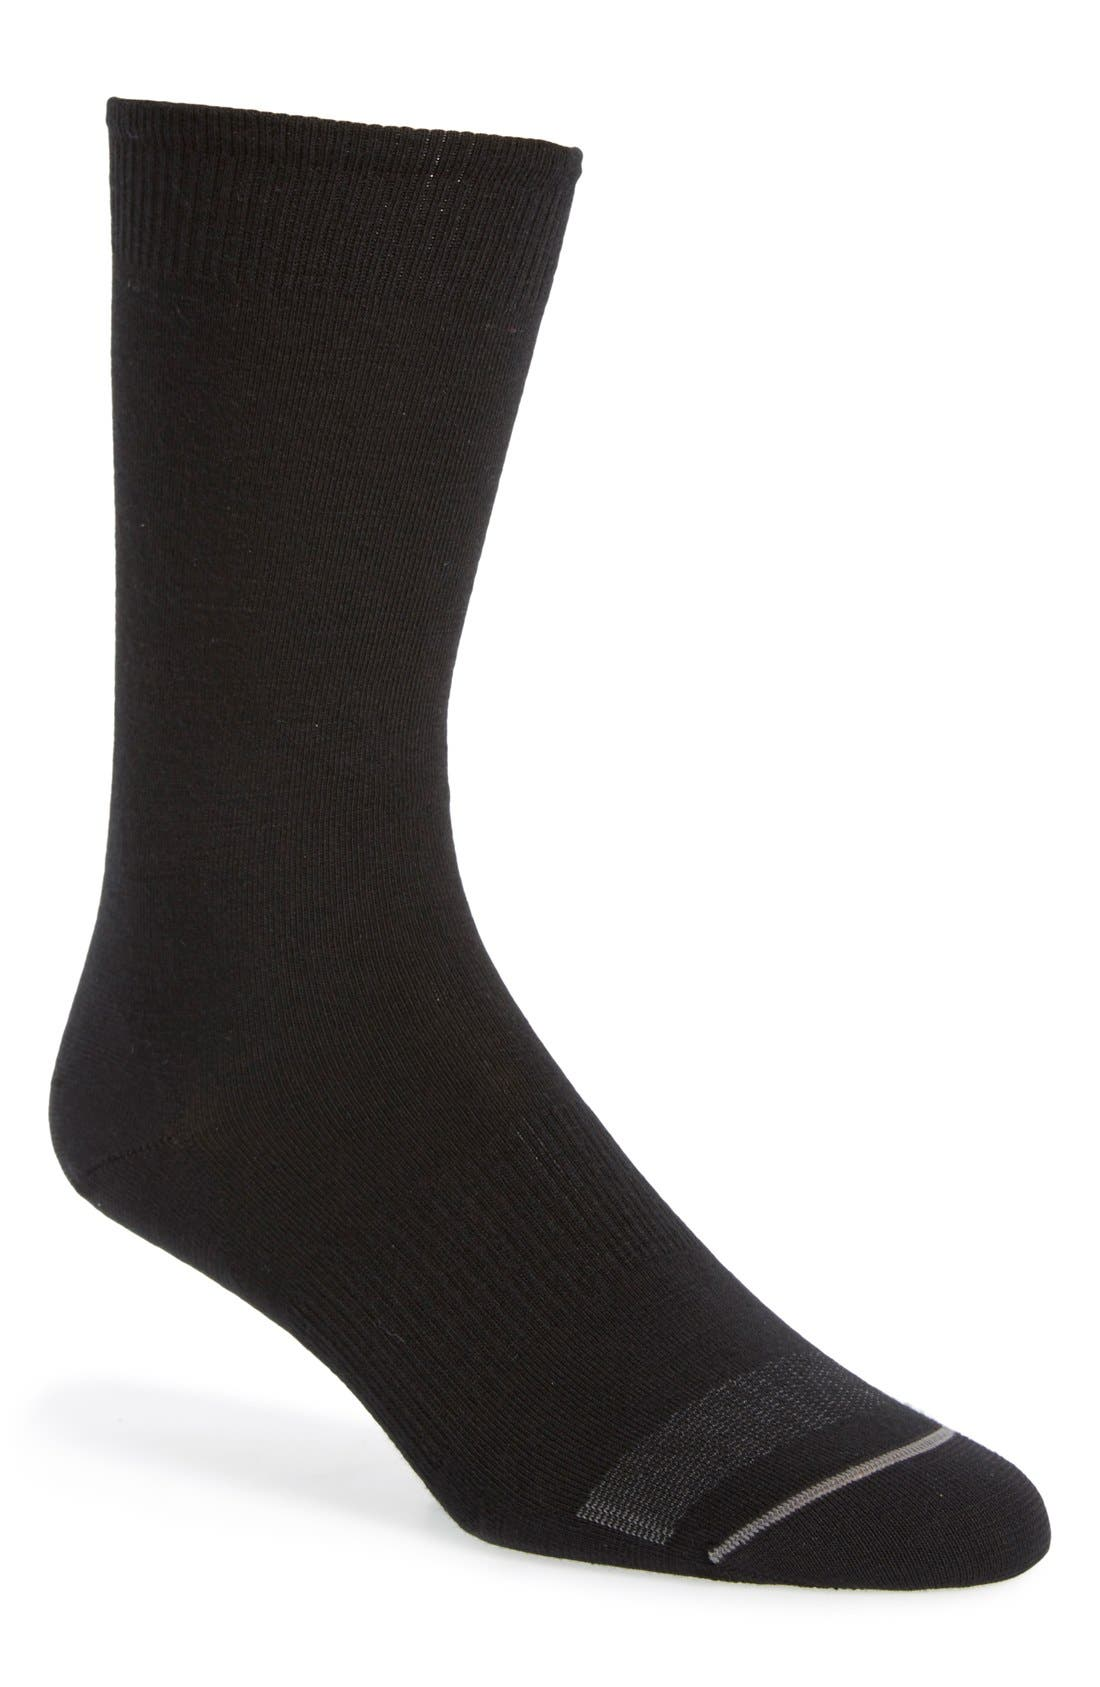 Main Image - Smartwool 'Anchor Line' Merino Wool Blend Socks